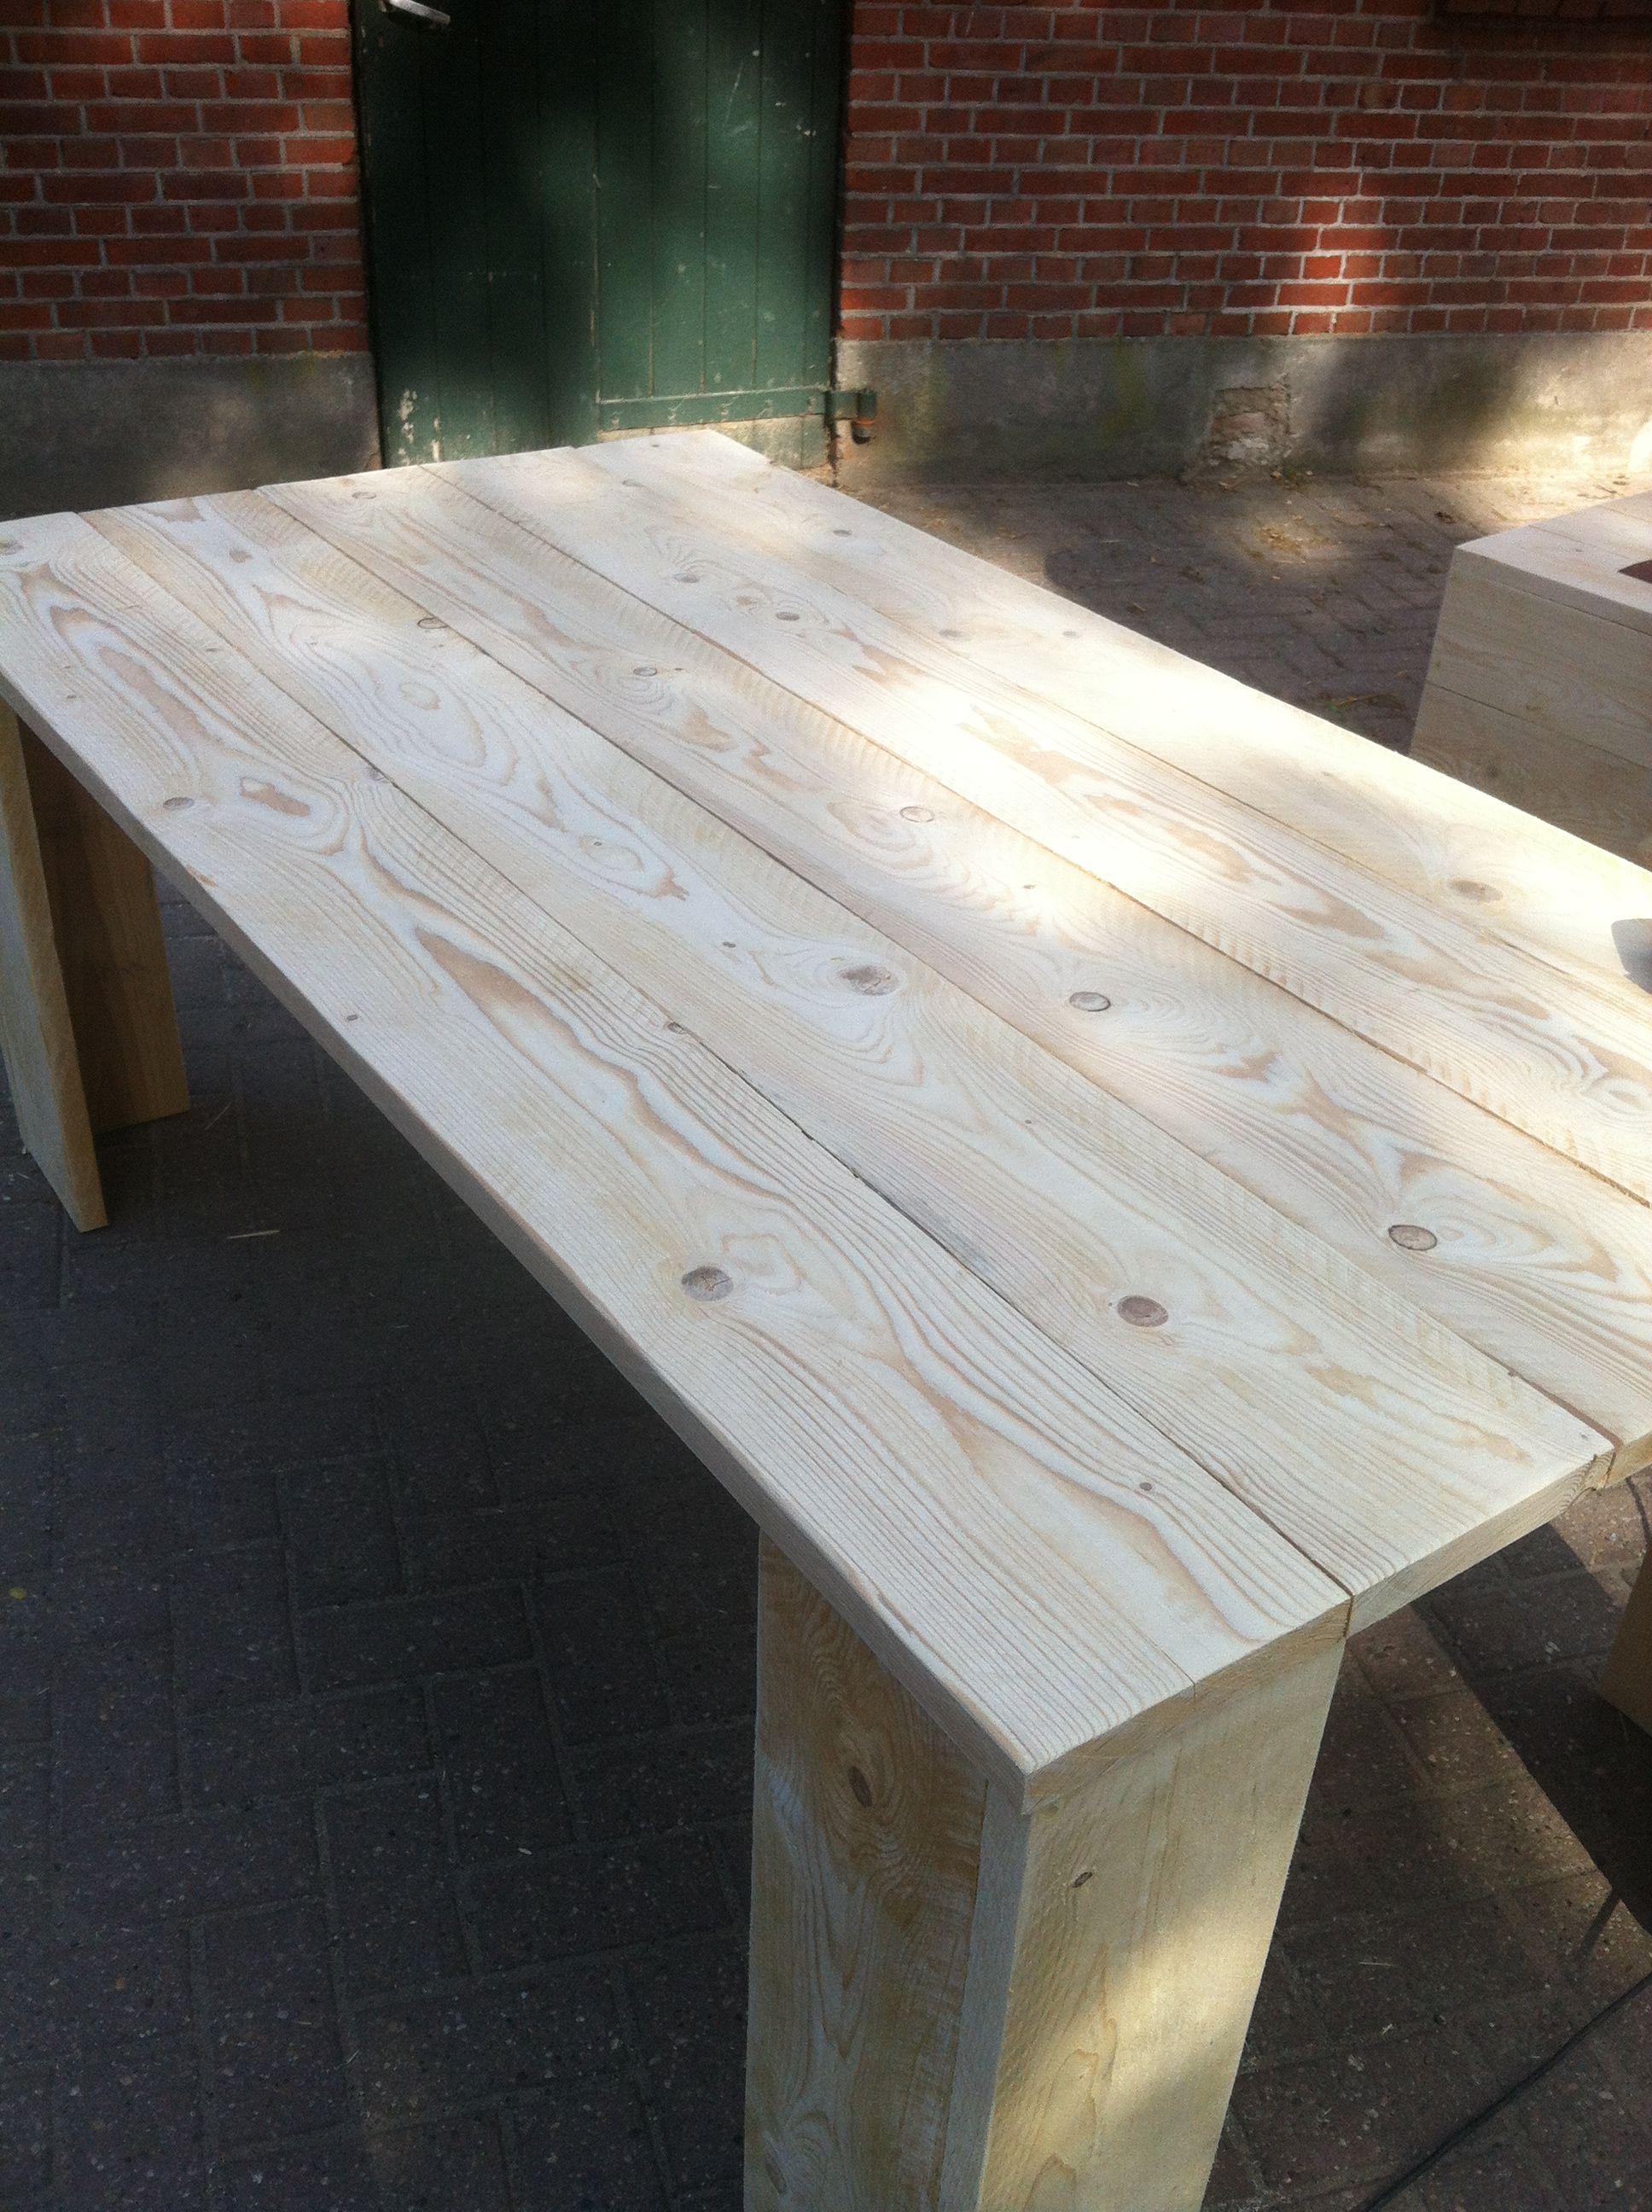 Mooie Steigerhouten Tafel.Steigerhouten Tafel Basic Sevilla Mooie Grote Robuuste